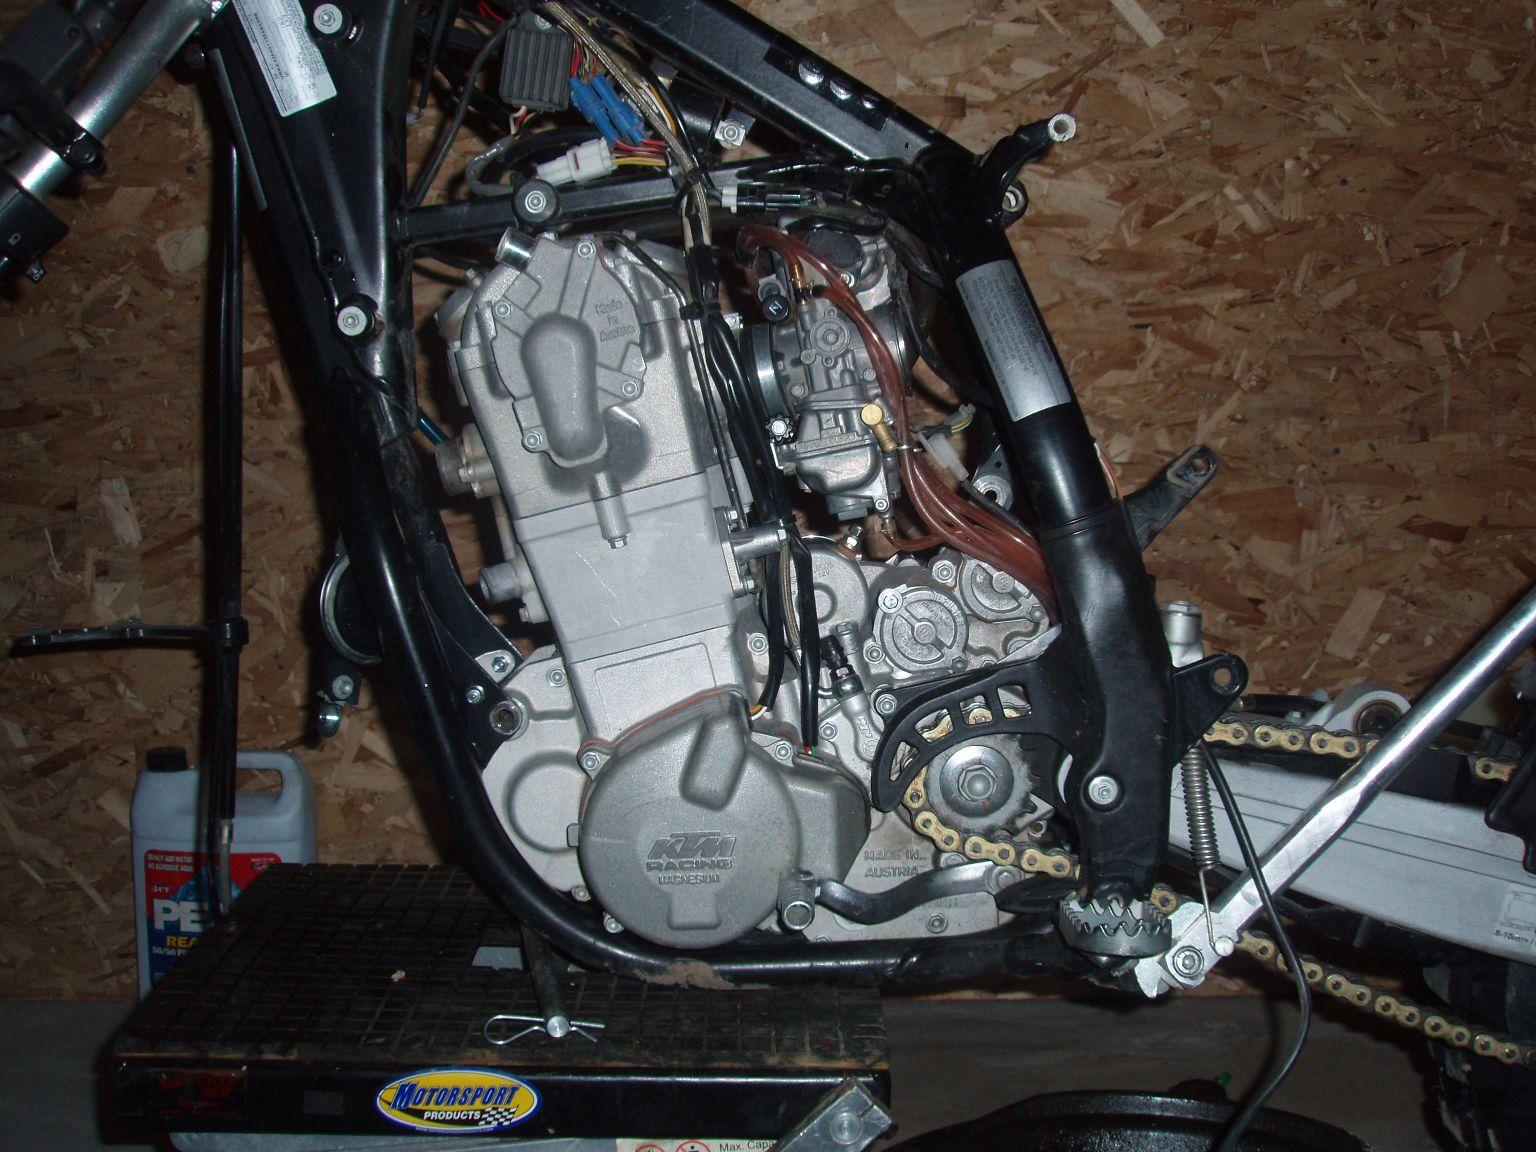 2007 Ktm 450 Exc Wiring Diagram Free Download 2008 Engine 525 Fuse Box Data Diagrams U2022